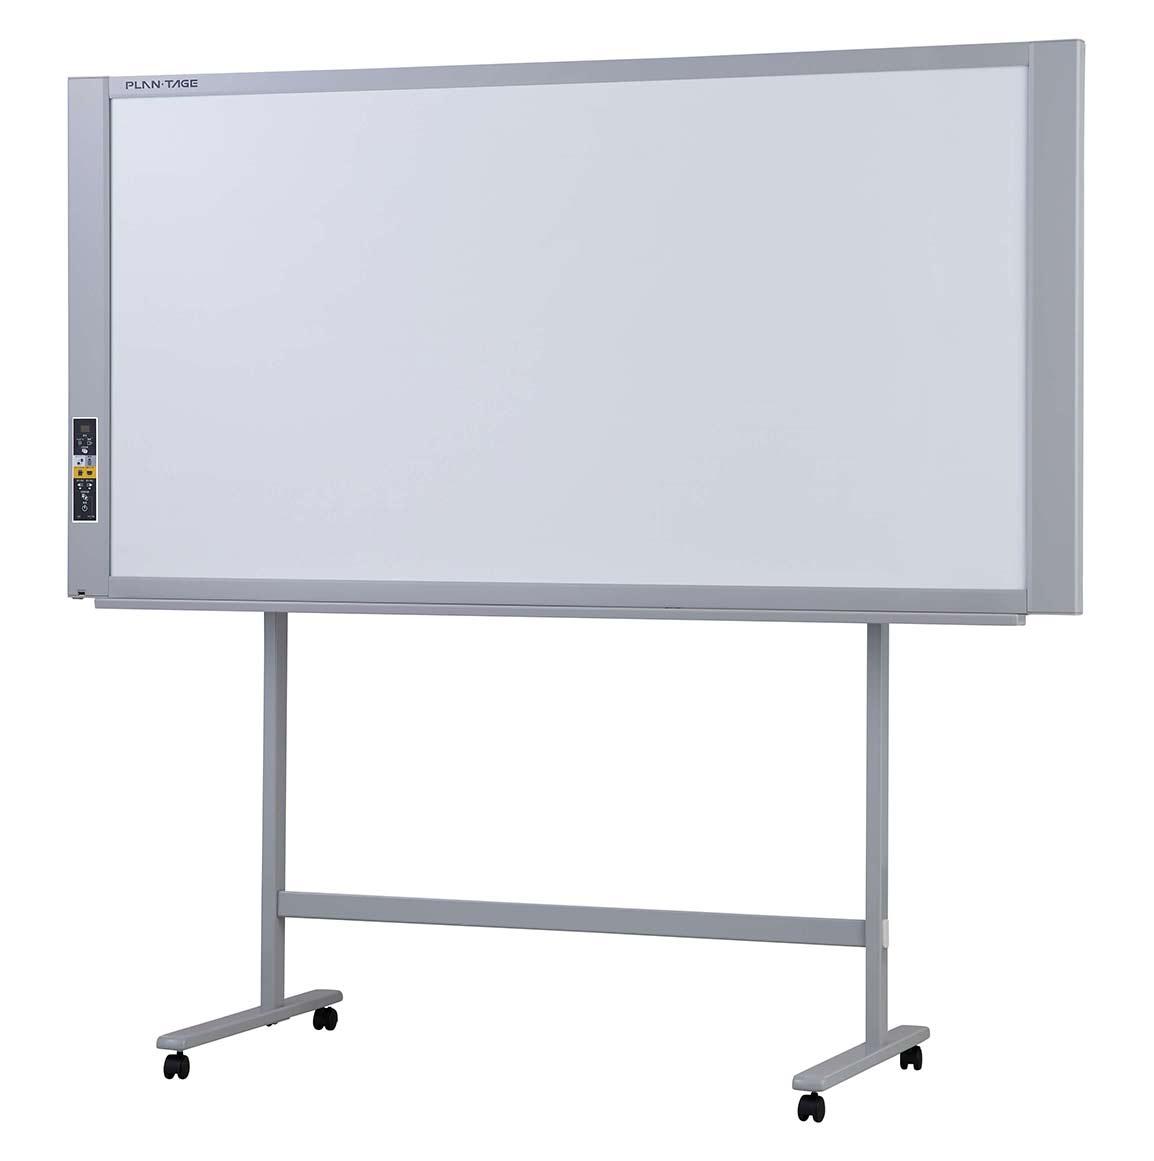 NICHIGAKU『電子黒板 プラン テージ 』